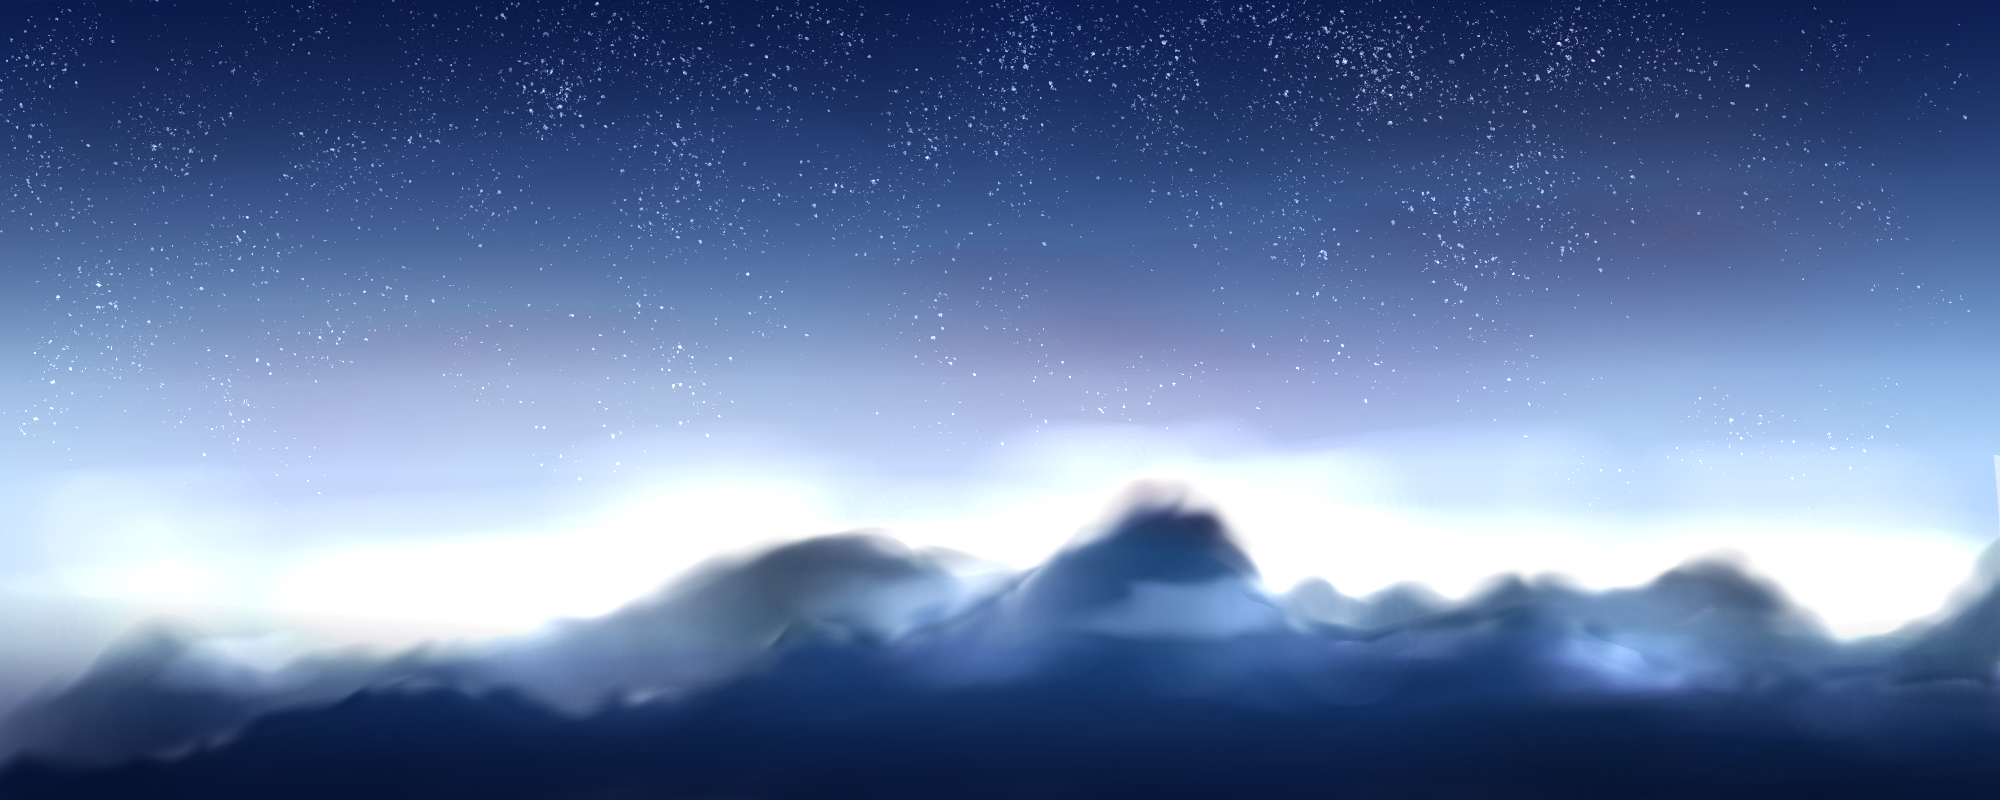 山。 Illust of 如月来蕾≮TRPG≯ medibangpaint space 風景画 star clouds original 山 practice